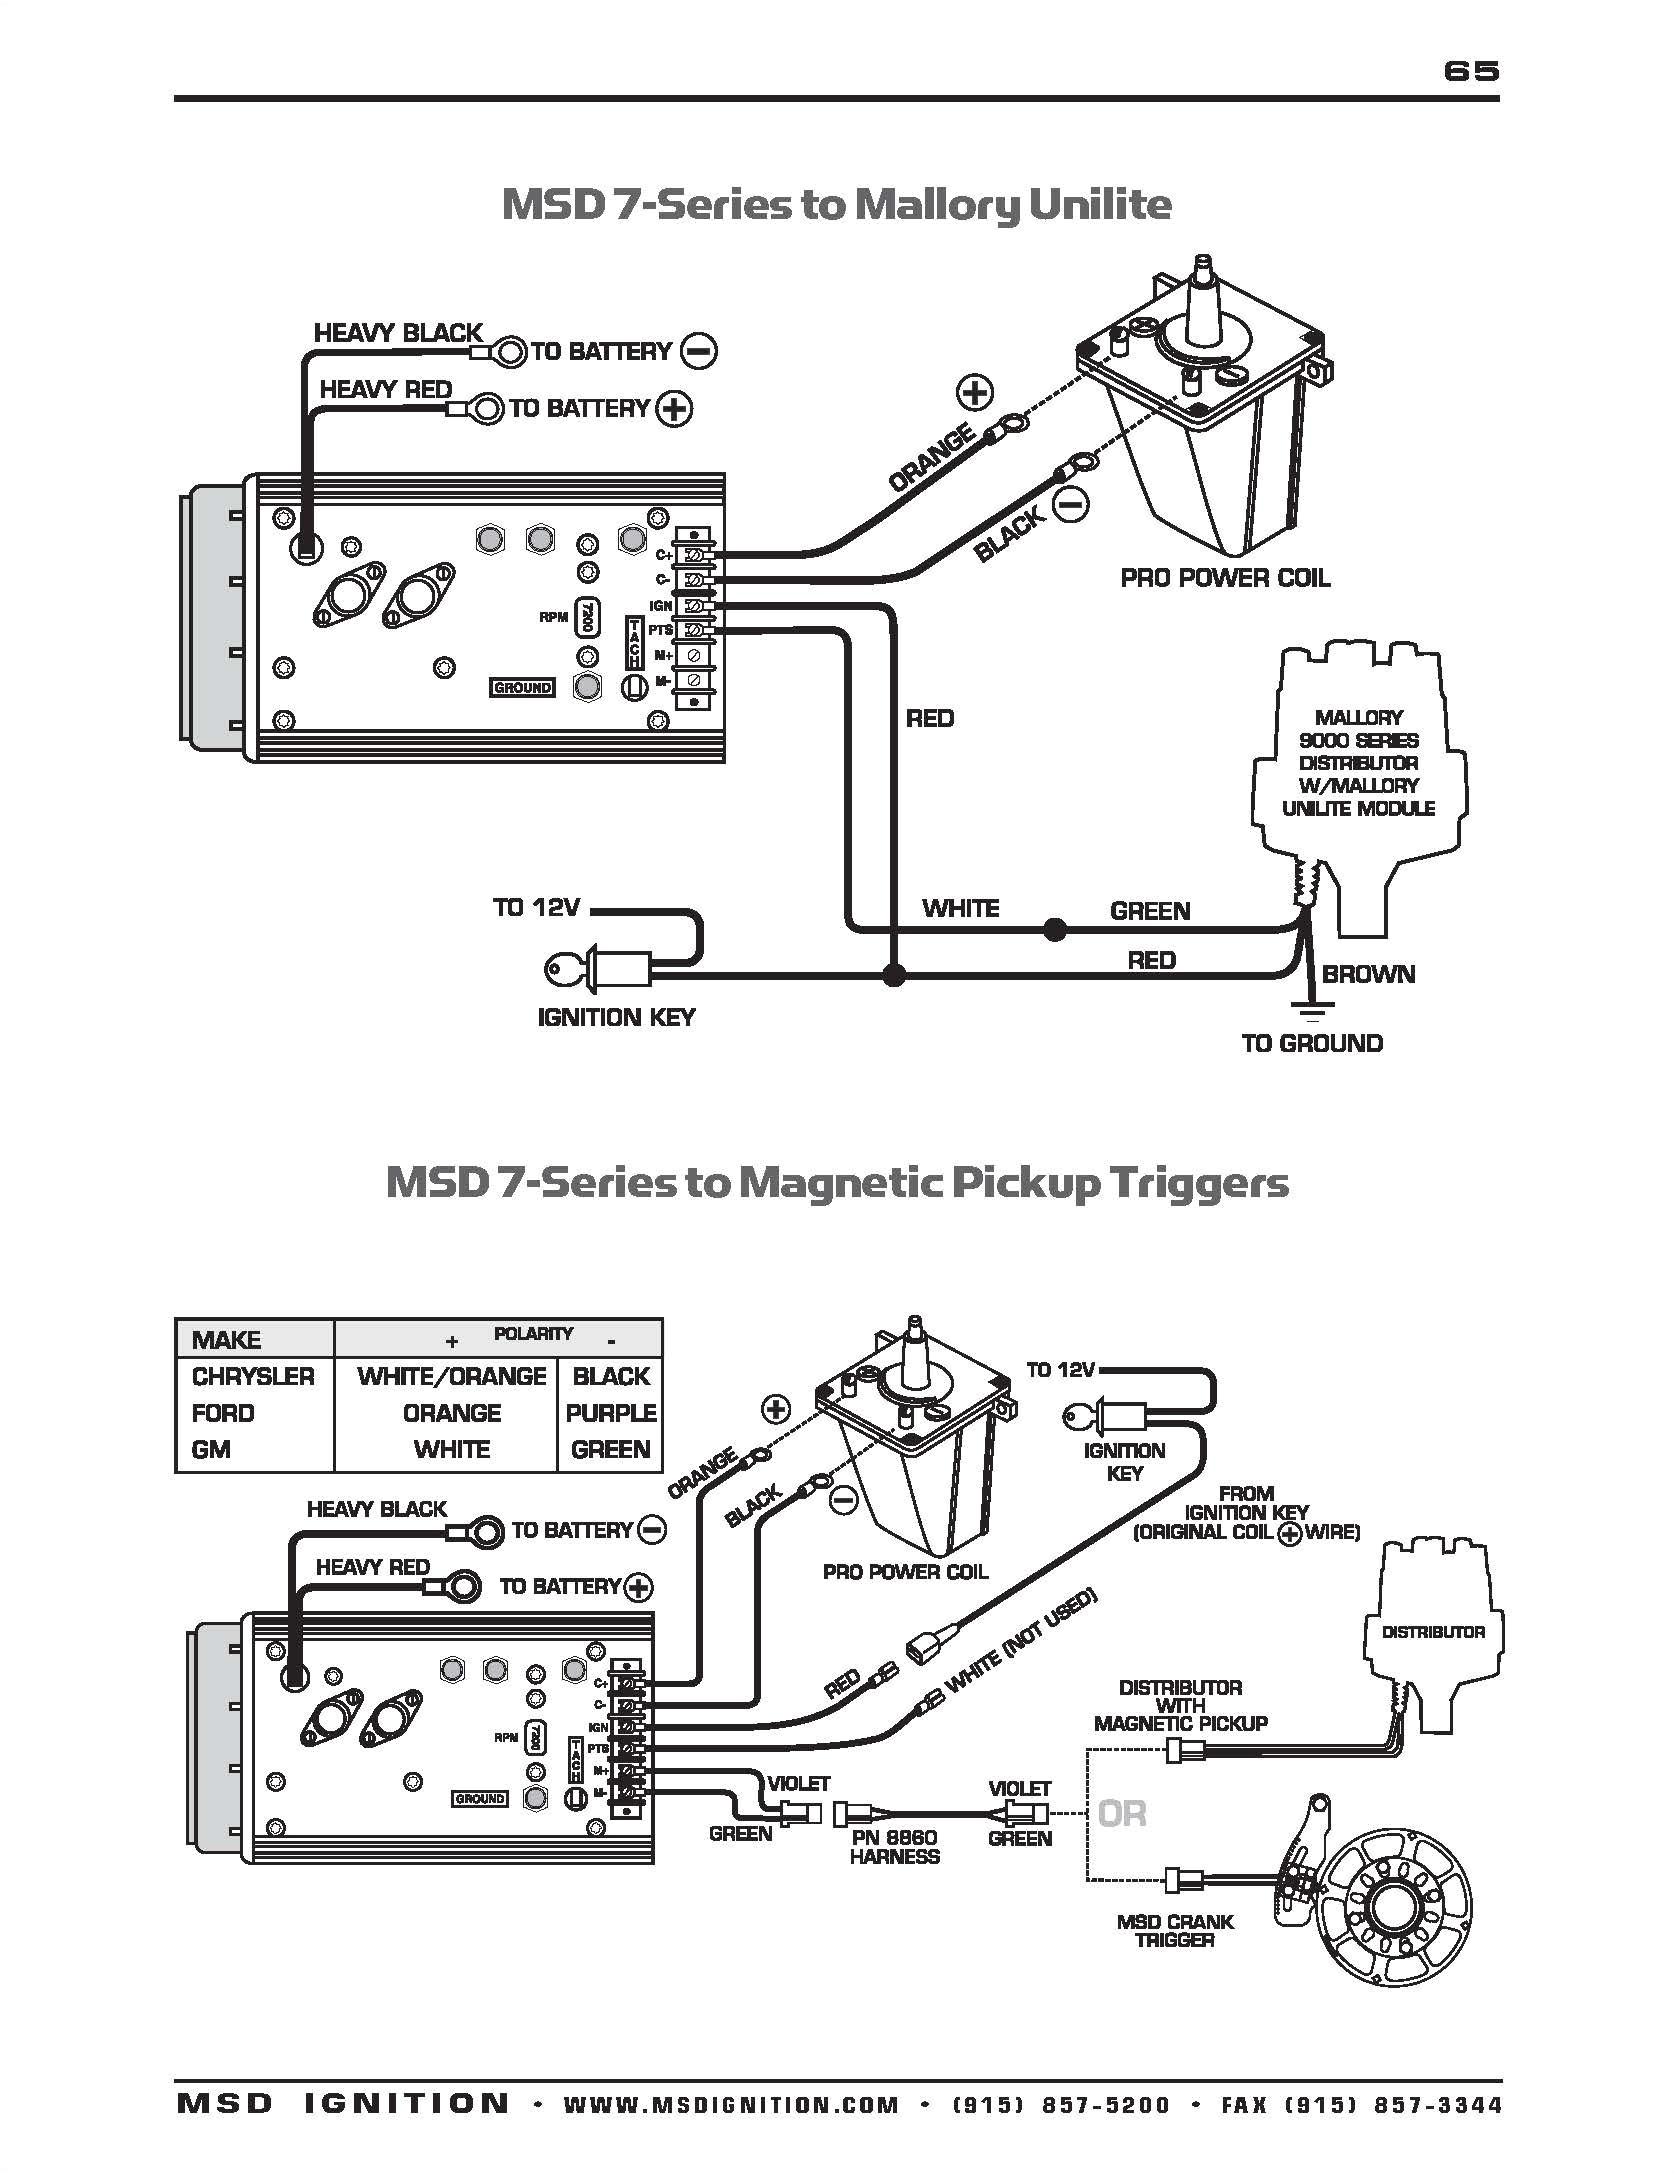 msd 7al wiring diagrams ford wiring diagram z4msd 7al wiring diagrams ford wiring diagram msd 7al